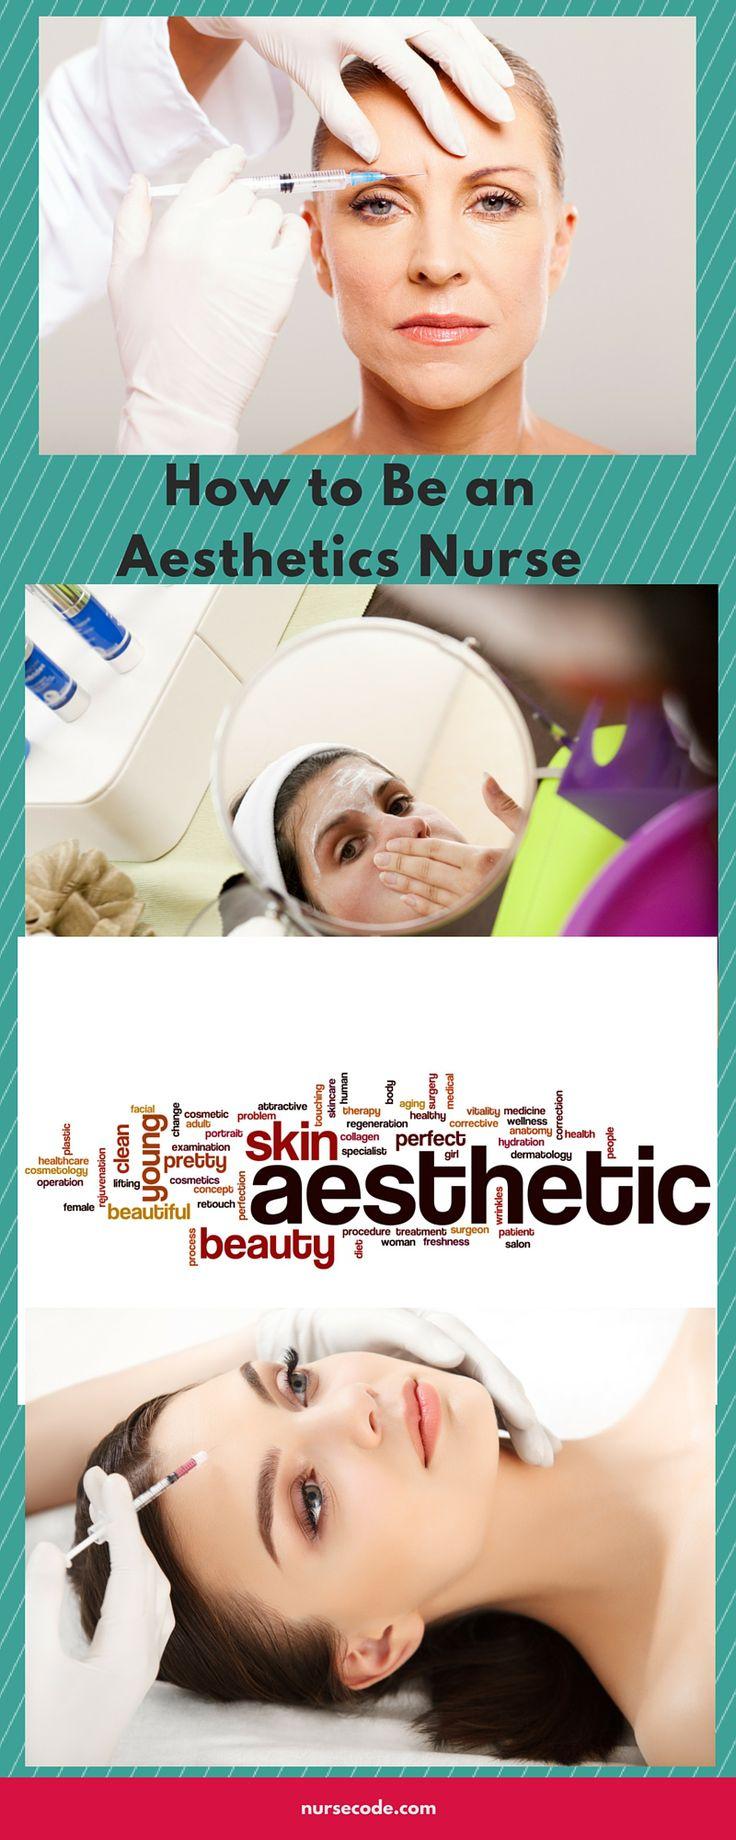 How to a Cosmetics Nurse Dermatology nurse, Nurse